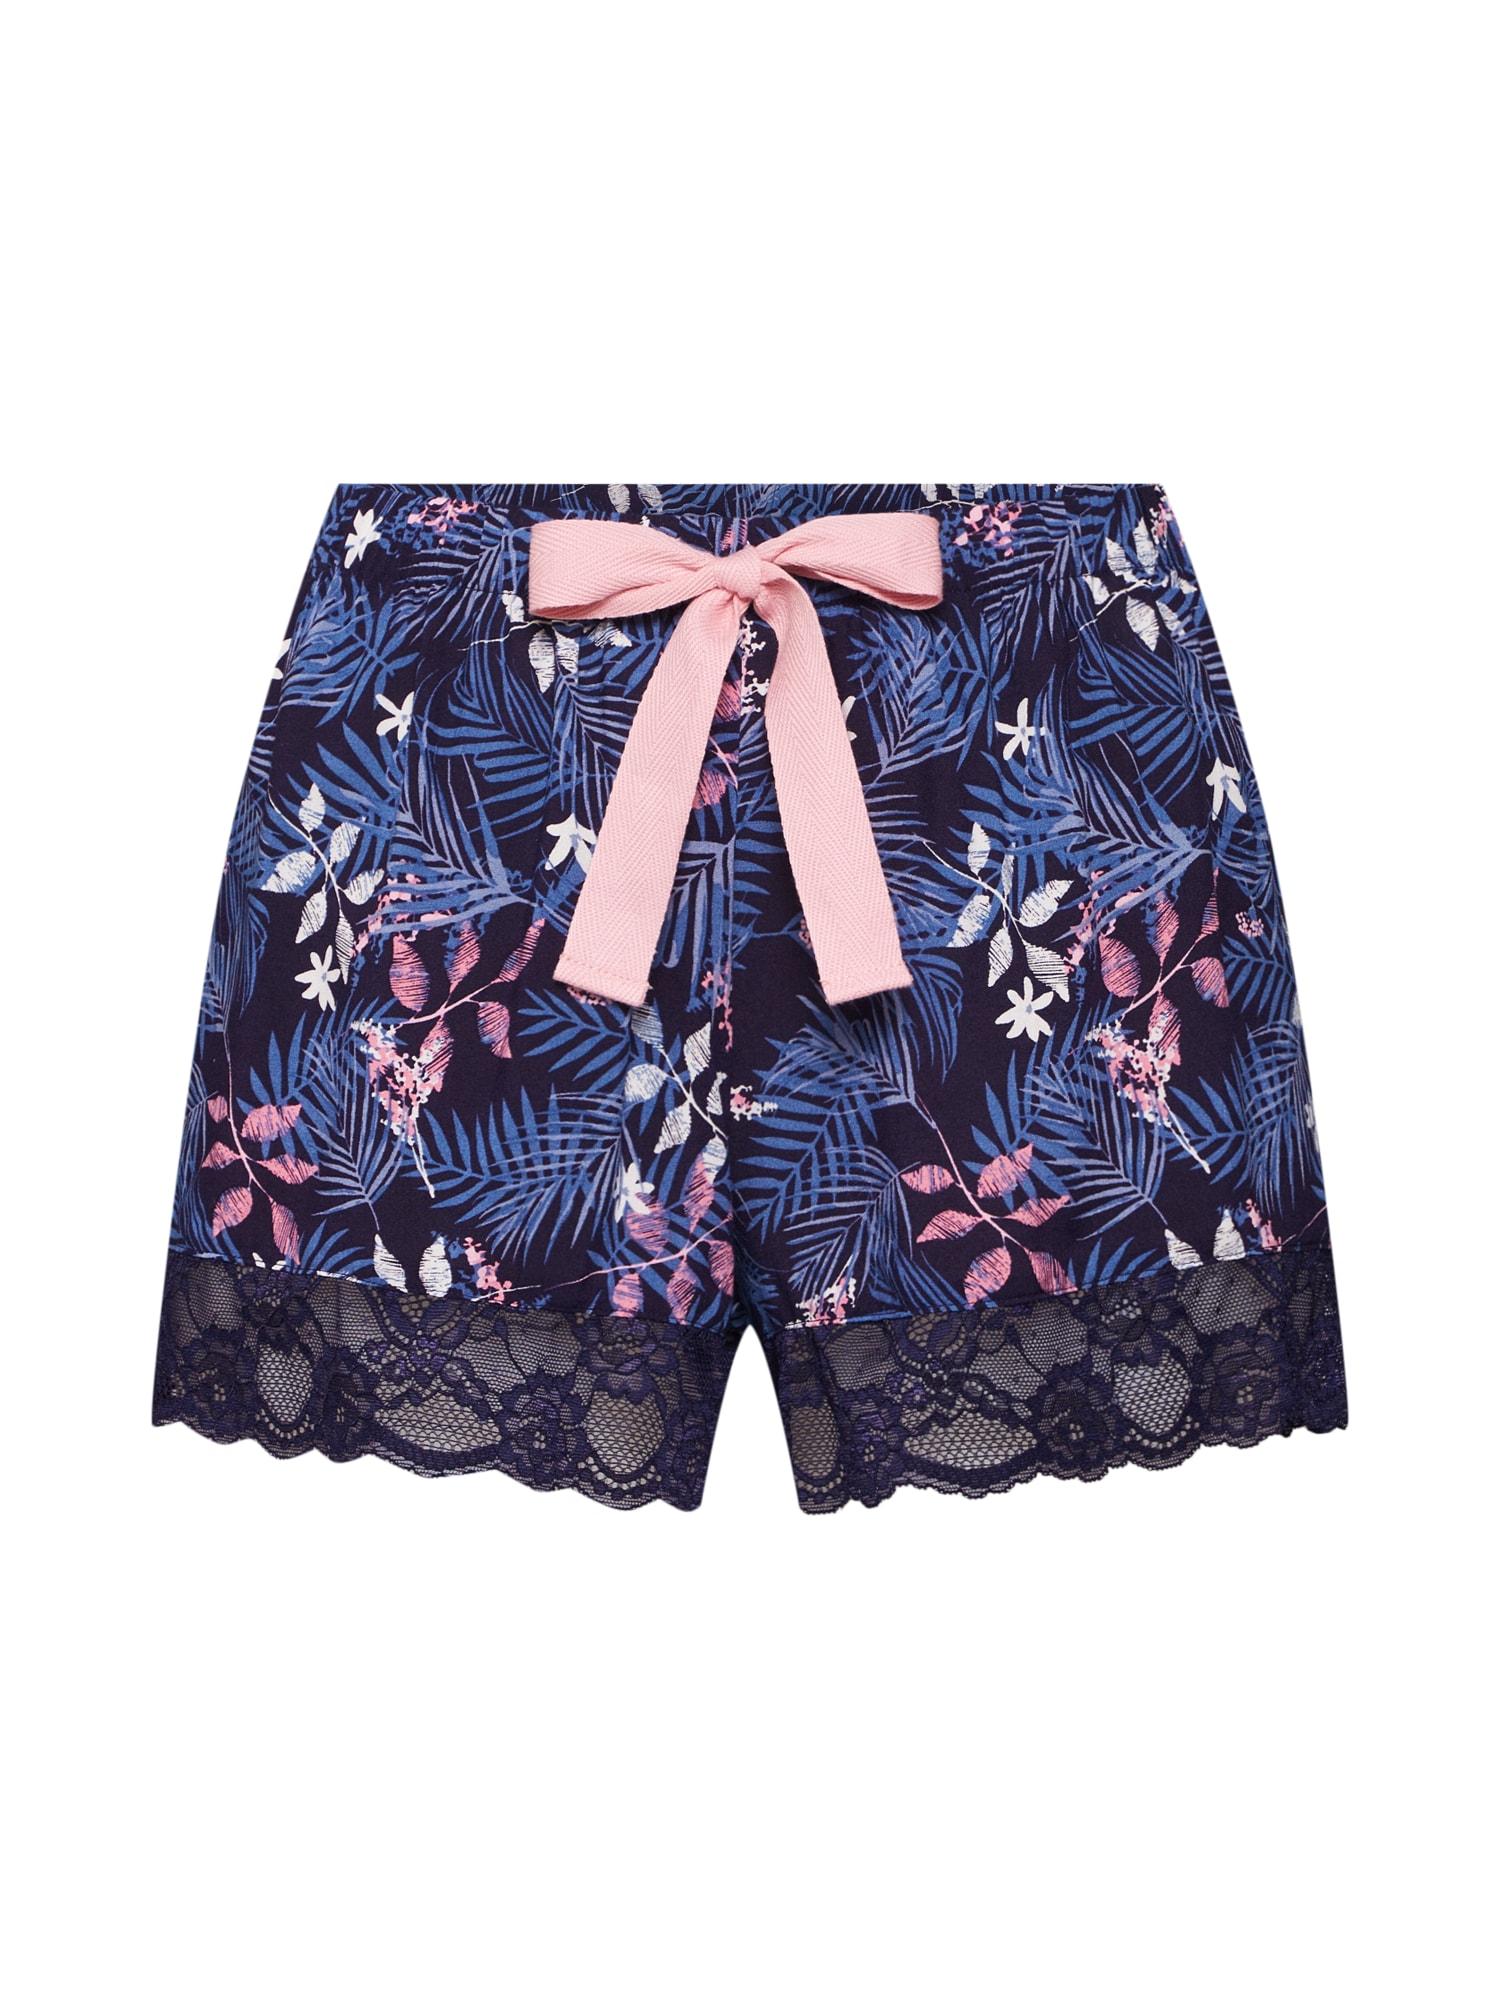 Pyžamové kalhoty Short Woven Tropical L modrá Hunkemöller